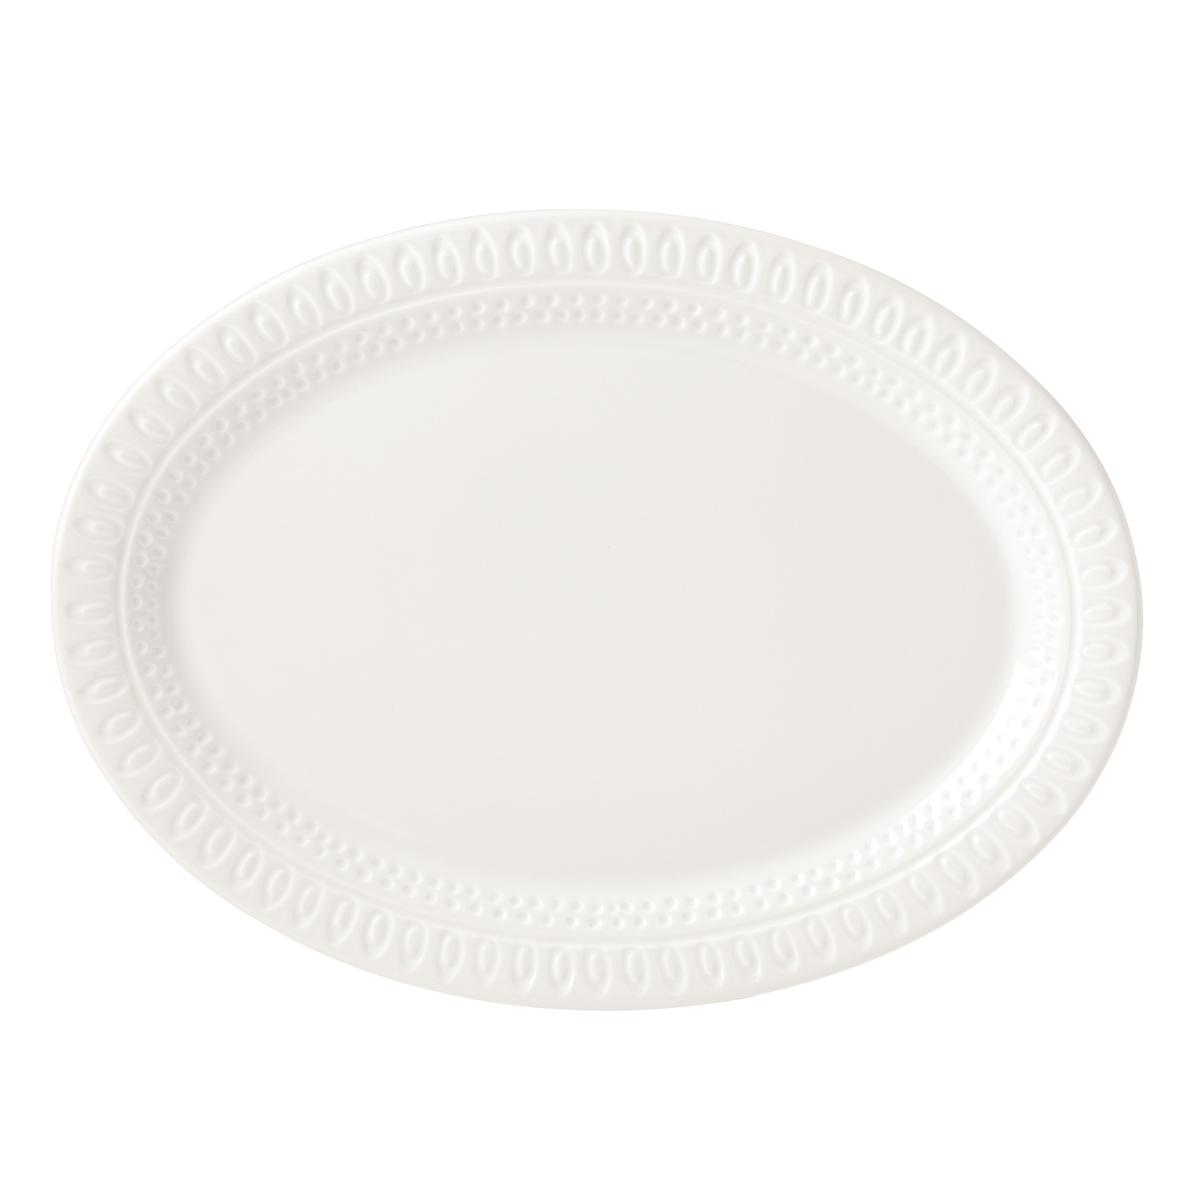 Kate Spade China by Lenox, Stoneware Willow Drive Cream Platter